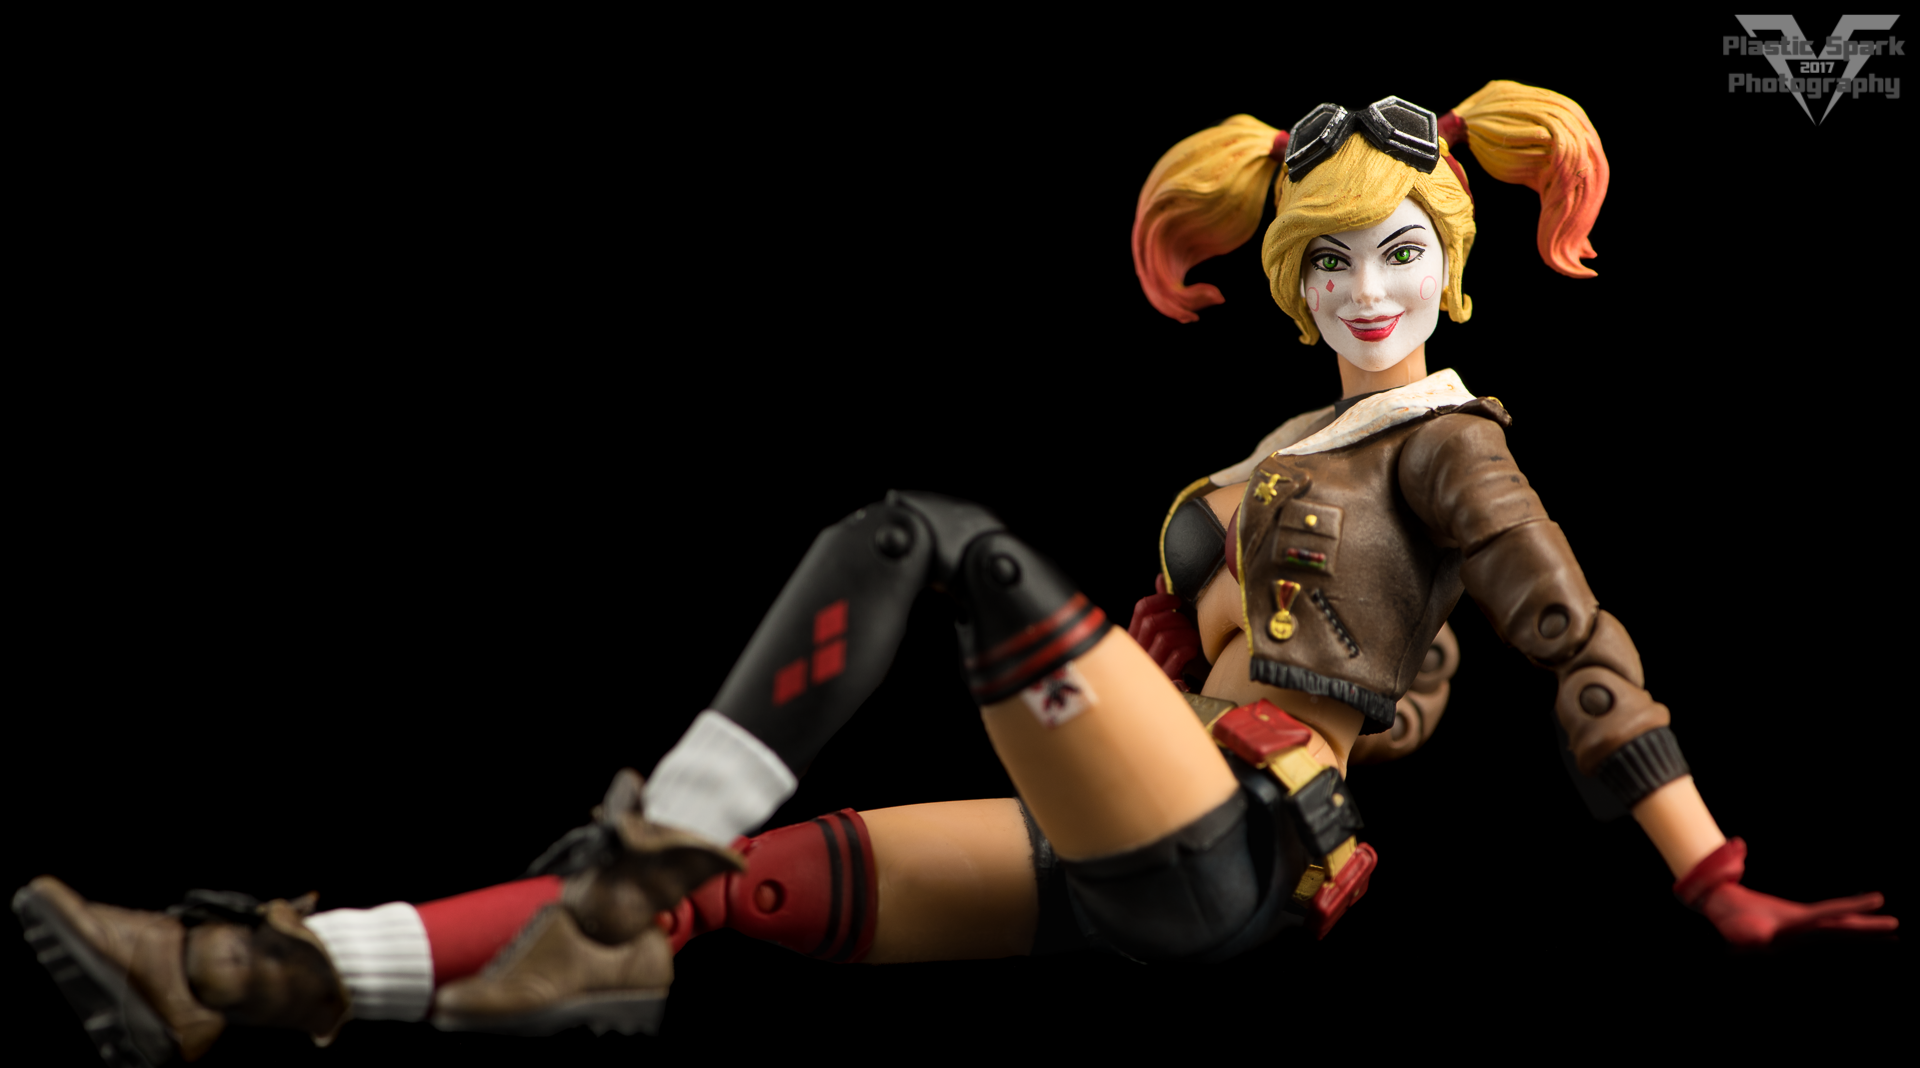 Bombshell-Harley-Quinn-Supplemental-(5-of-6).png